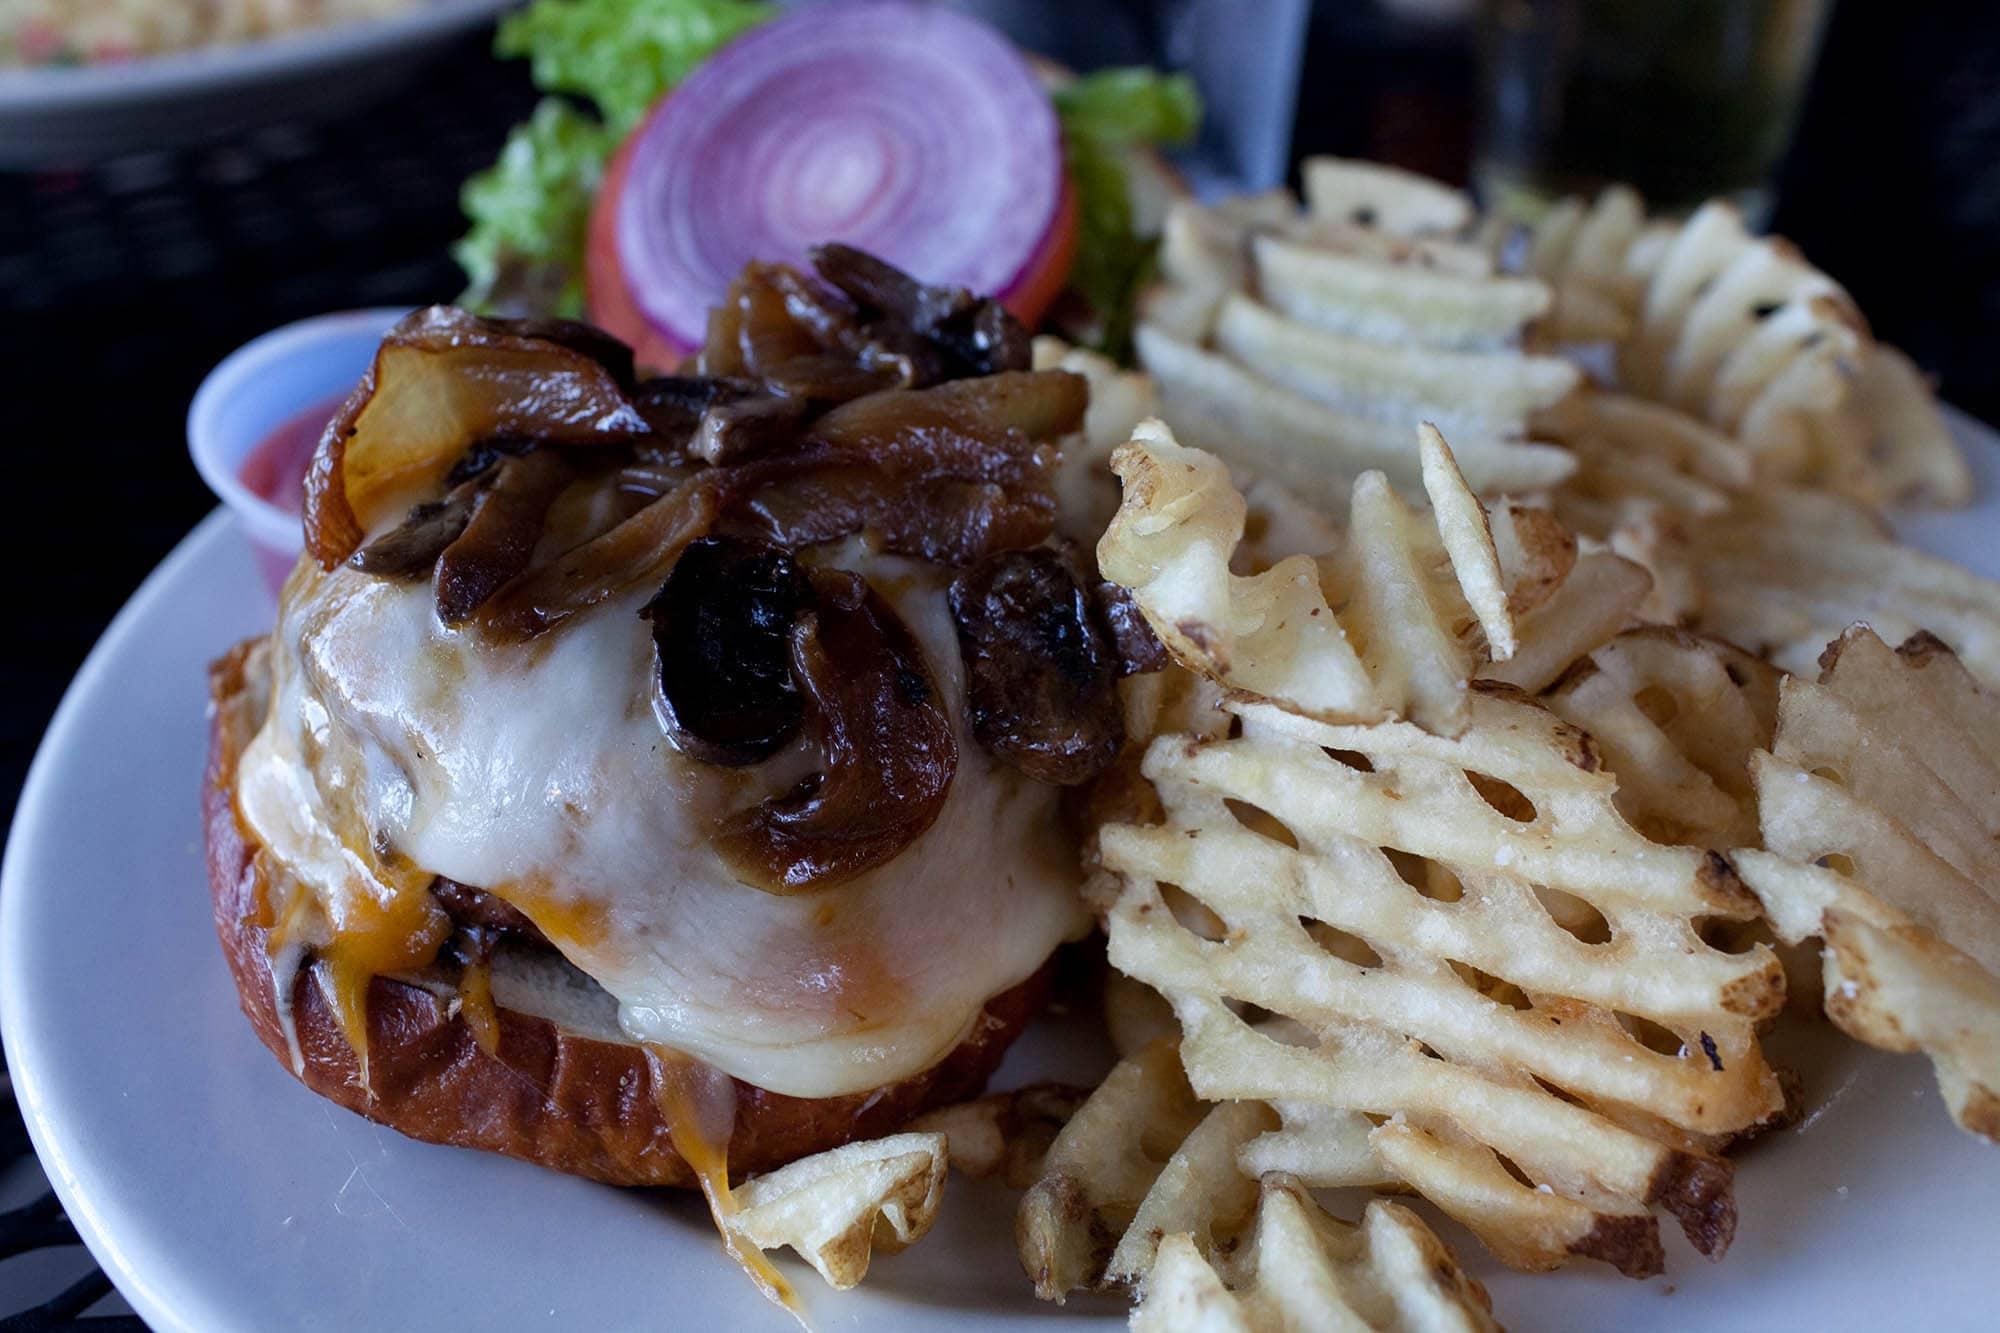 Kuma's Corner in Chicago, Illinois - Neurosis burger with cheddar, swiss, sautéed mushrooms, caramelized onions, and horseradish mayo